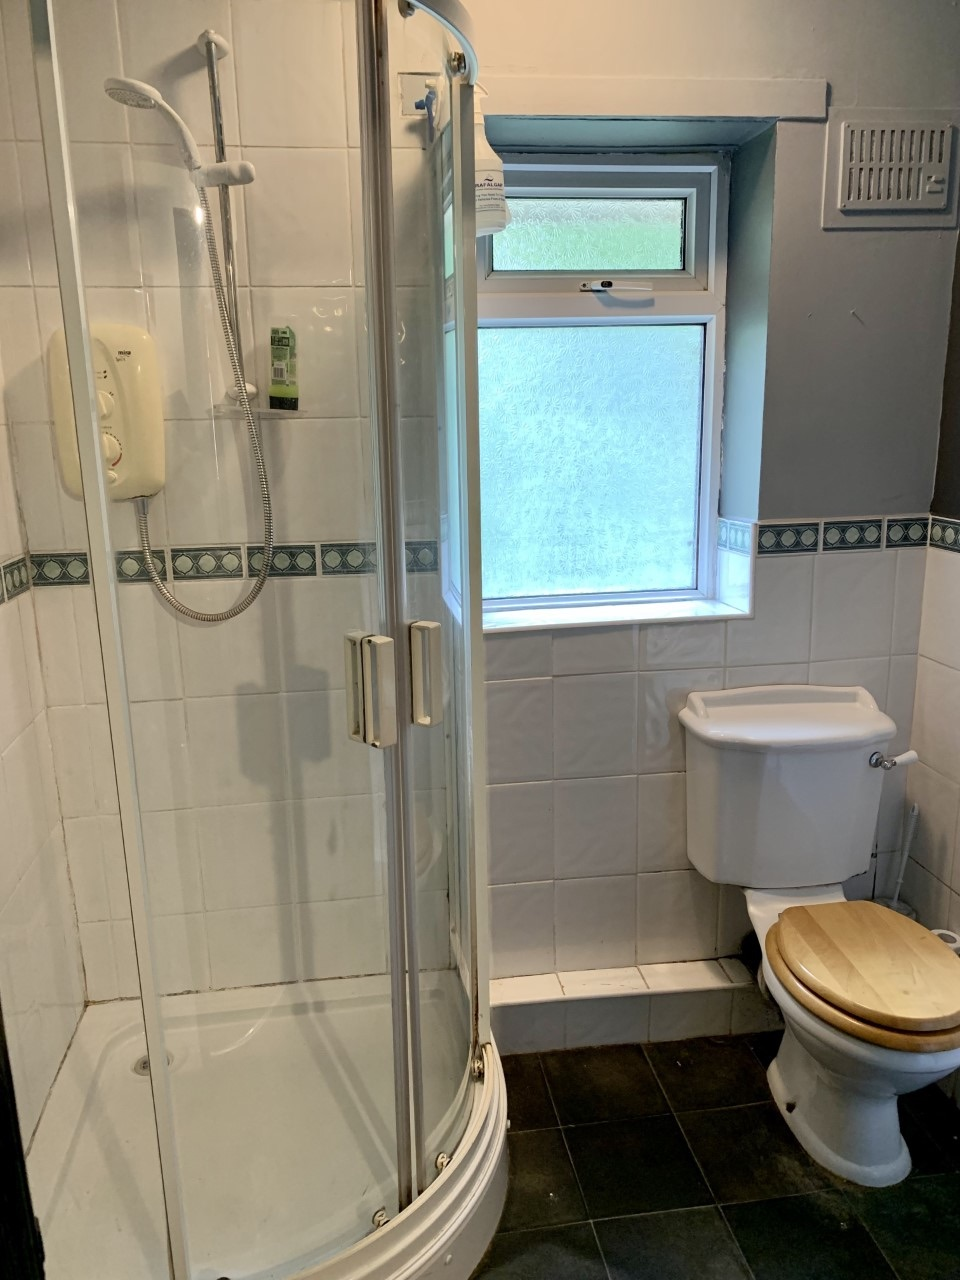 2 bedroom maisonette flat/apartment For Sale in Todmorden - Photograph 13.